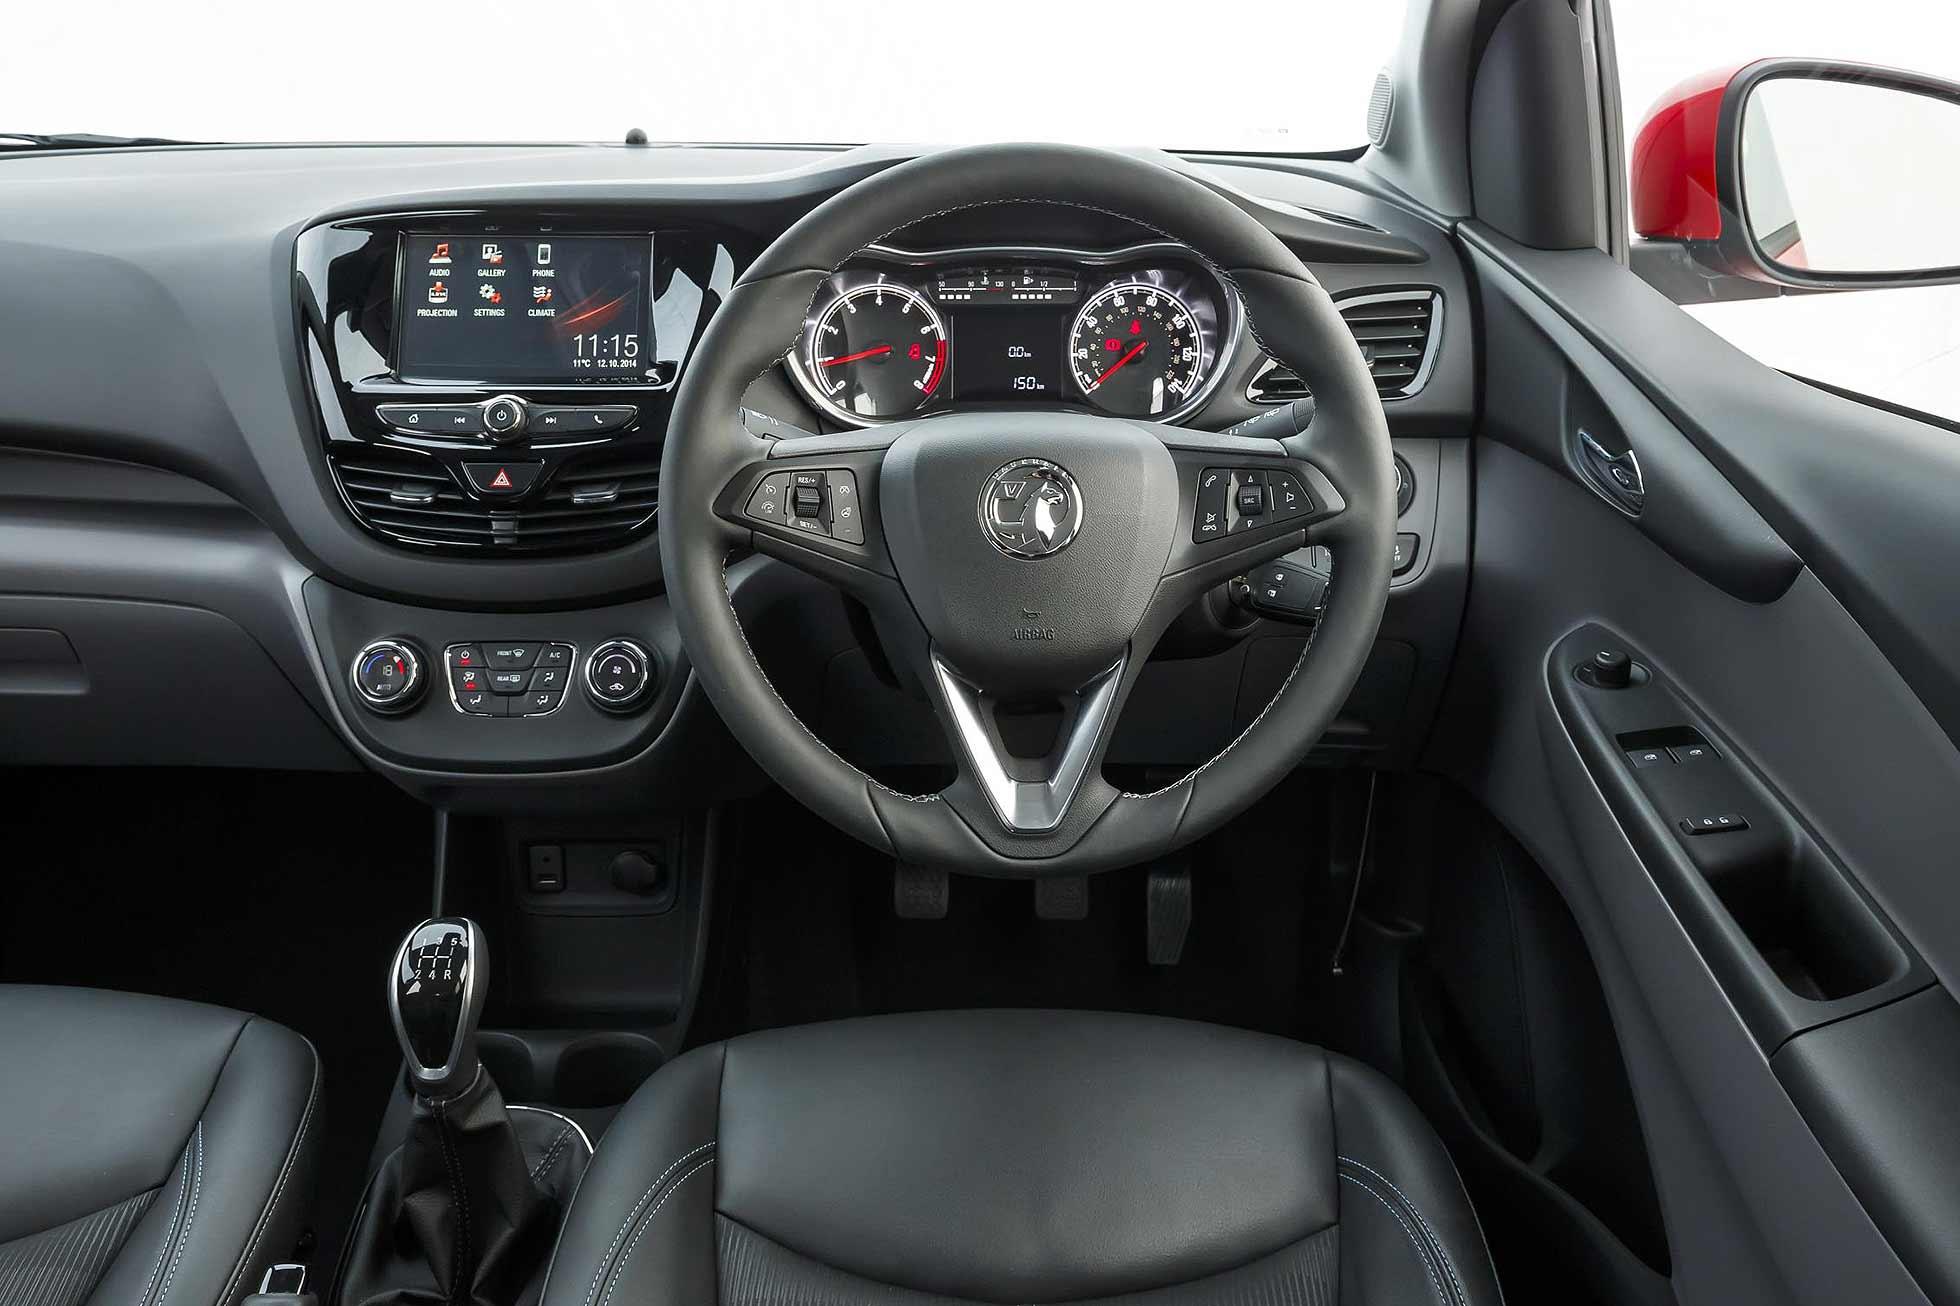 Vauxhall Viva interior